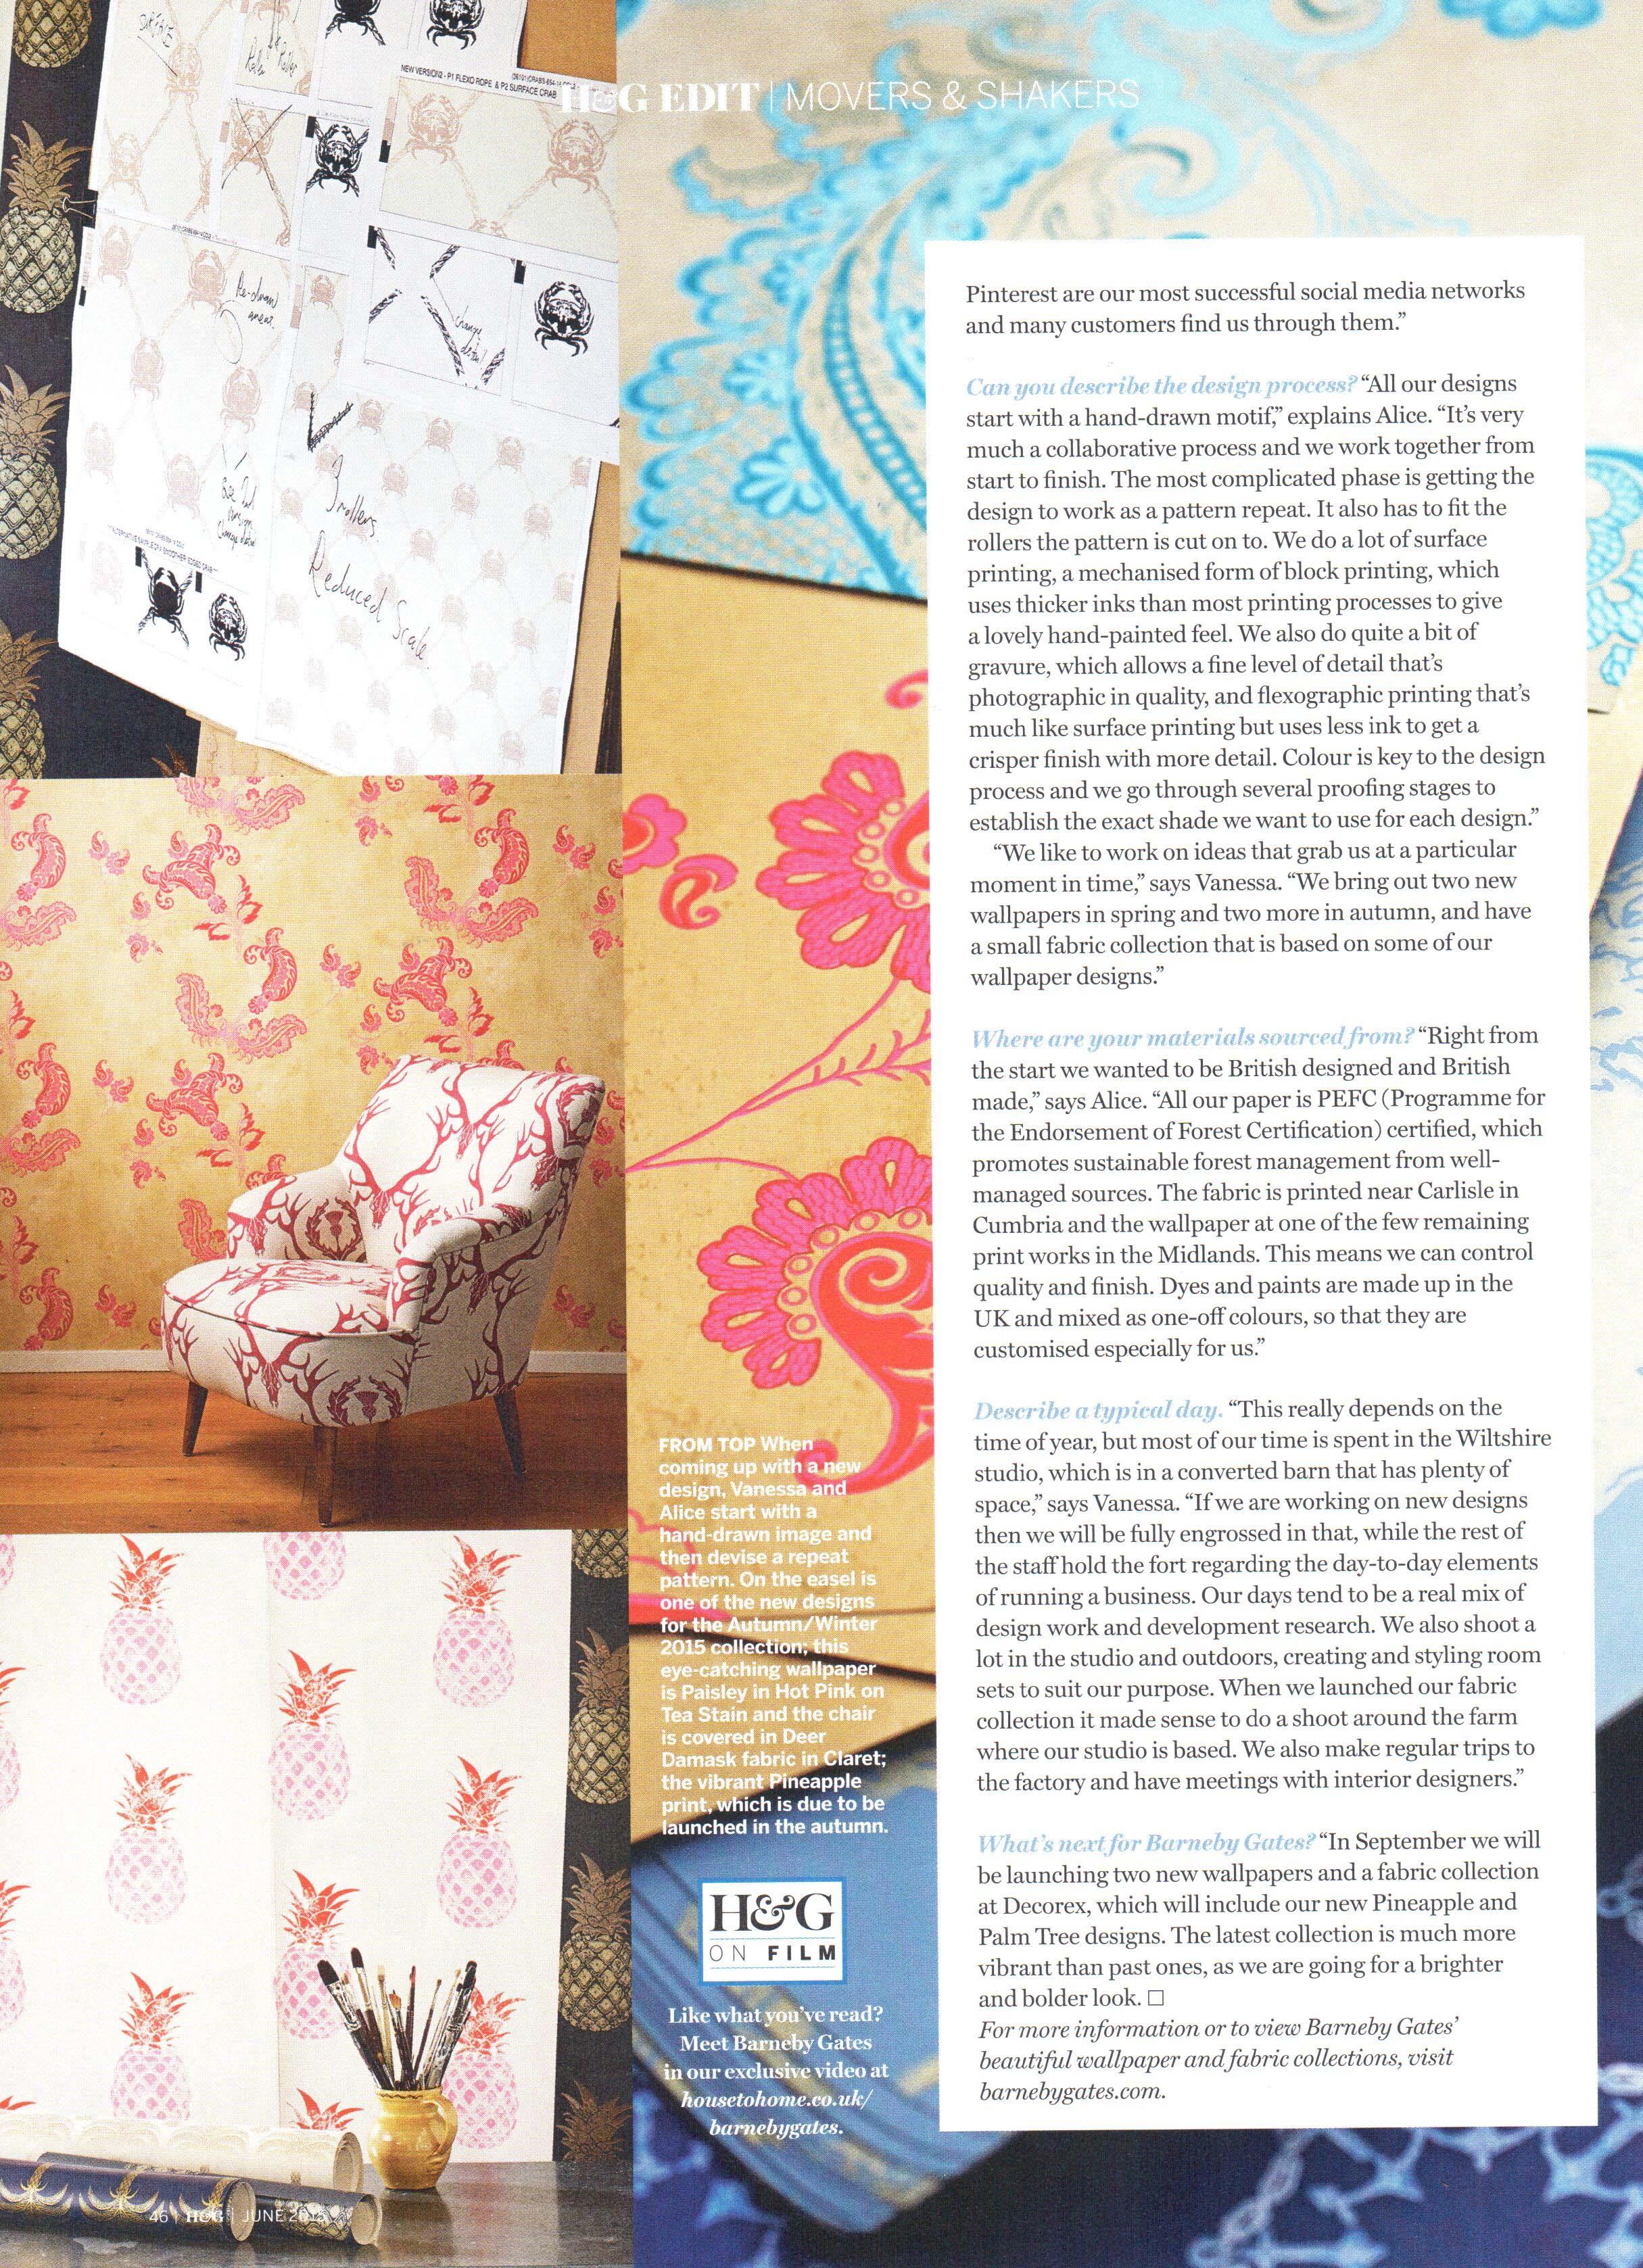 Homes & Gardens - Article3 - June 2015